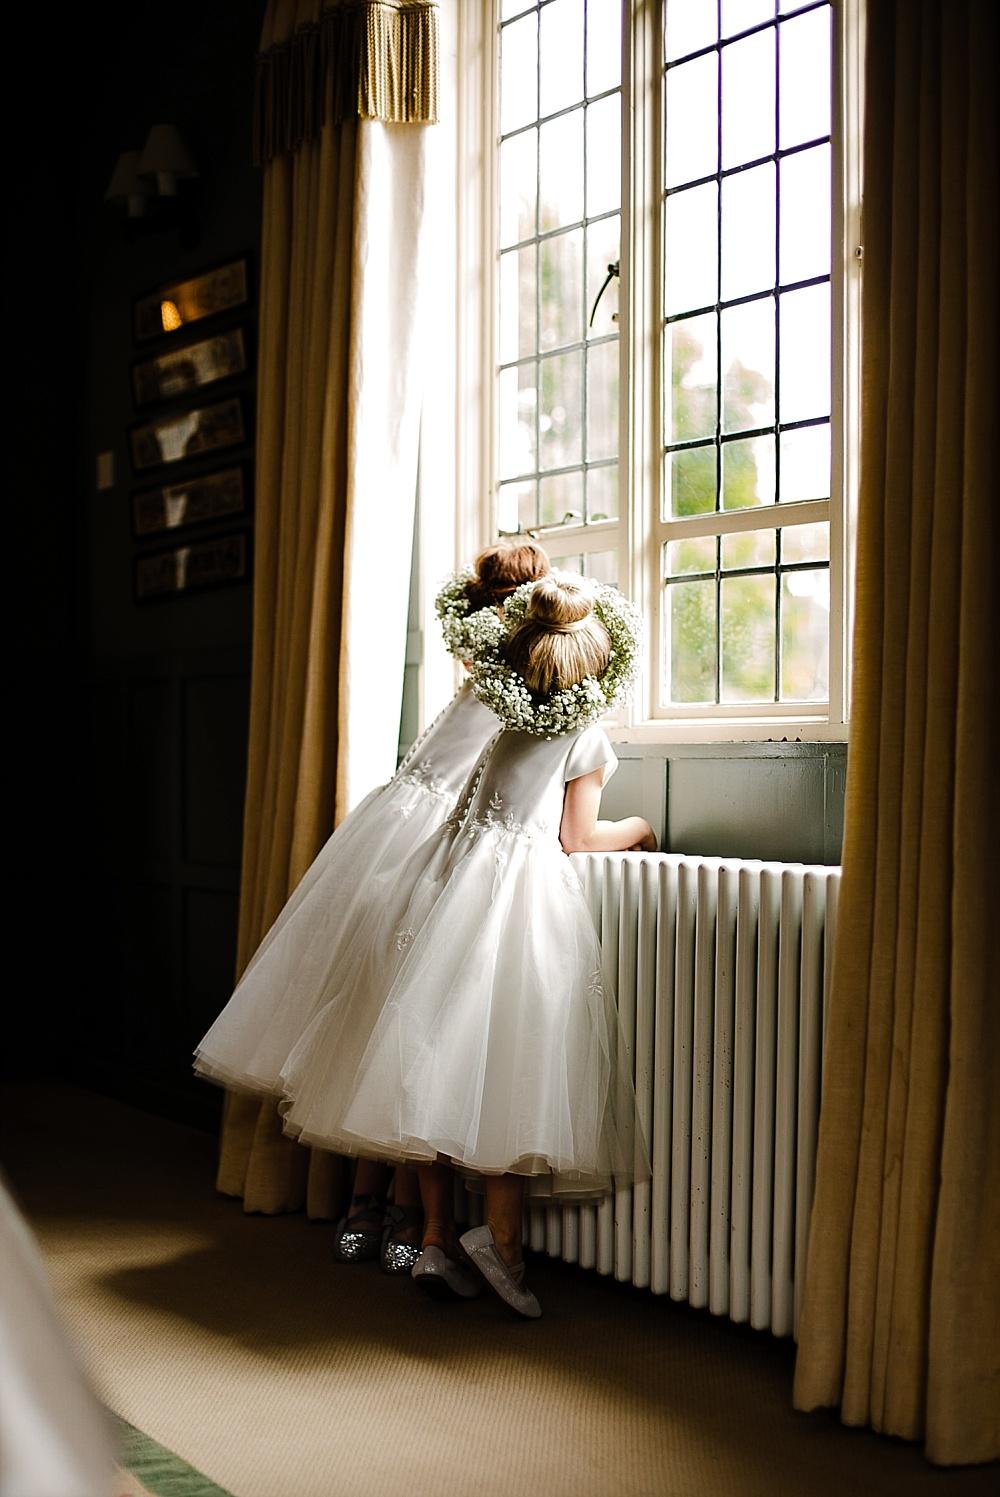 Houchins Wedding Photographer